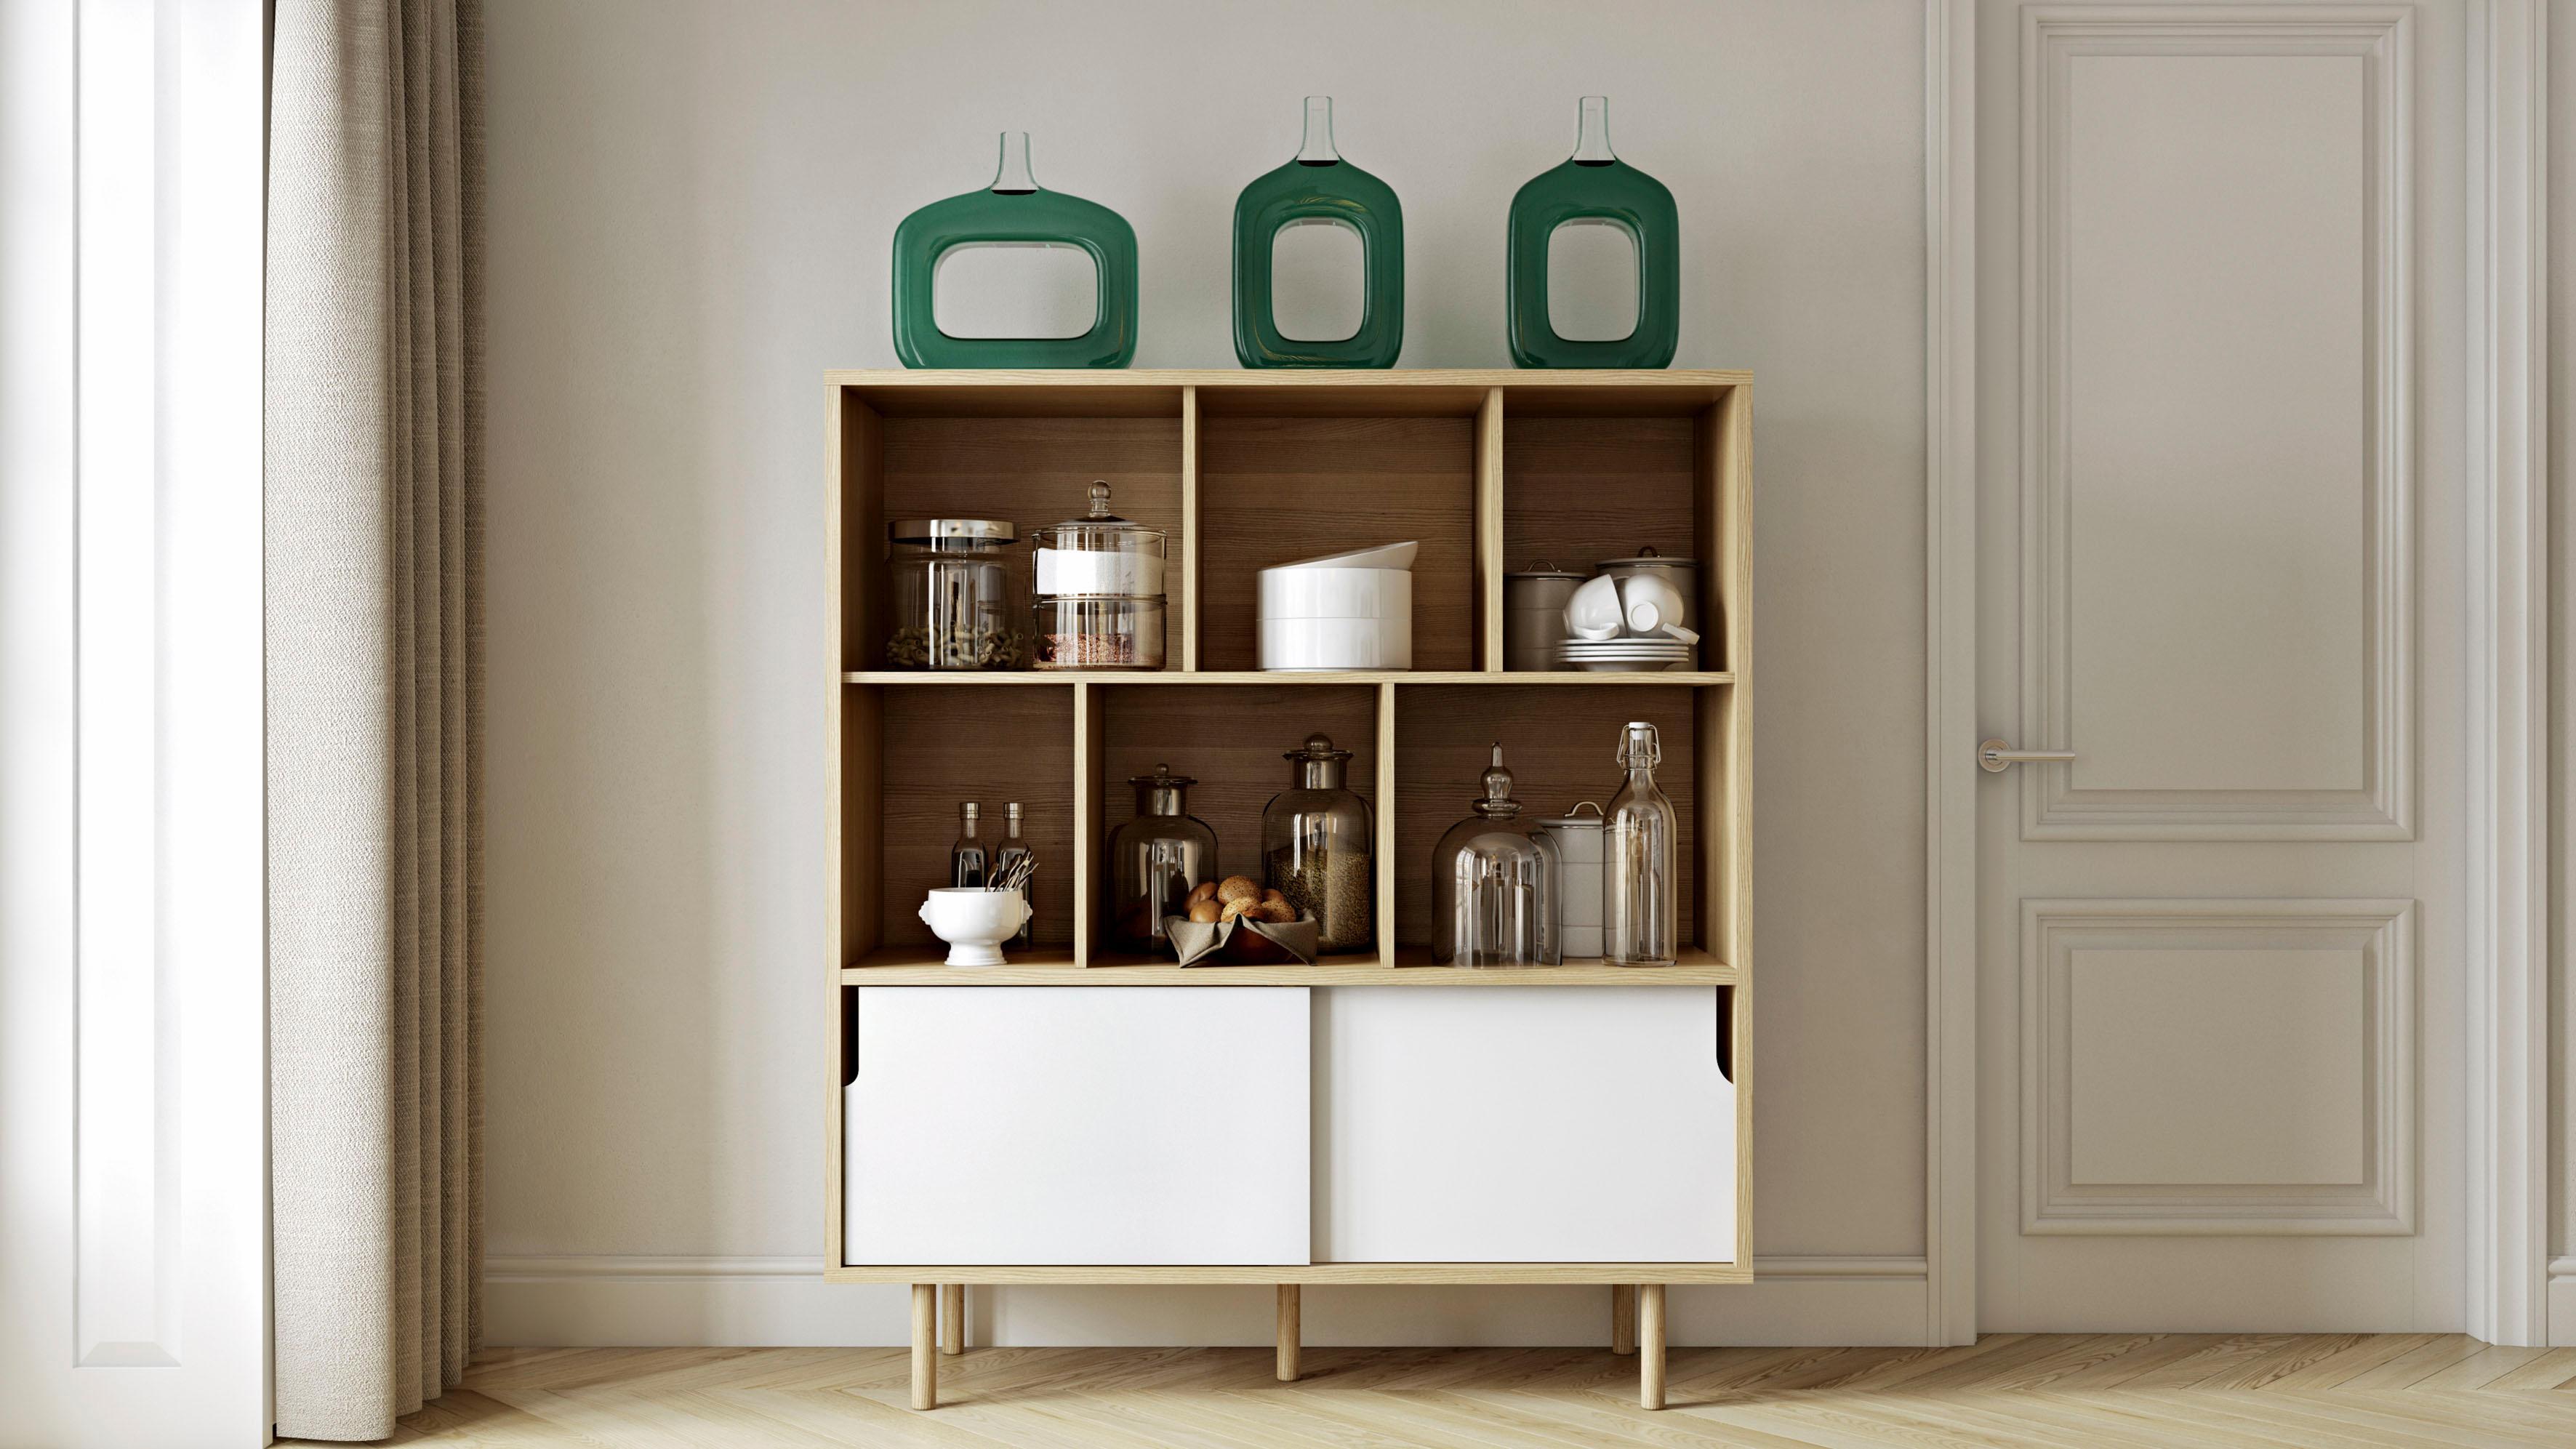 hoelzer Highboards online kaufen | Möbel-Suchmaschine | ladendirekt.de